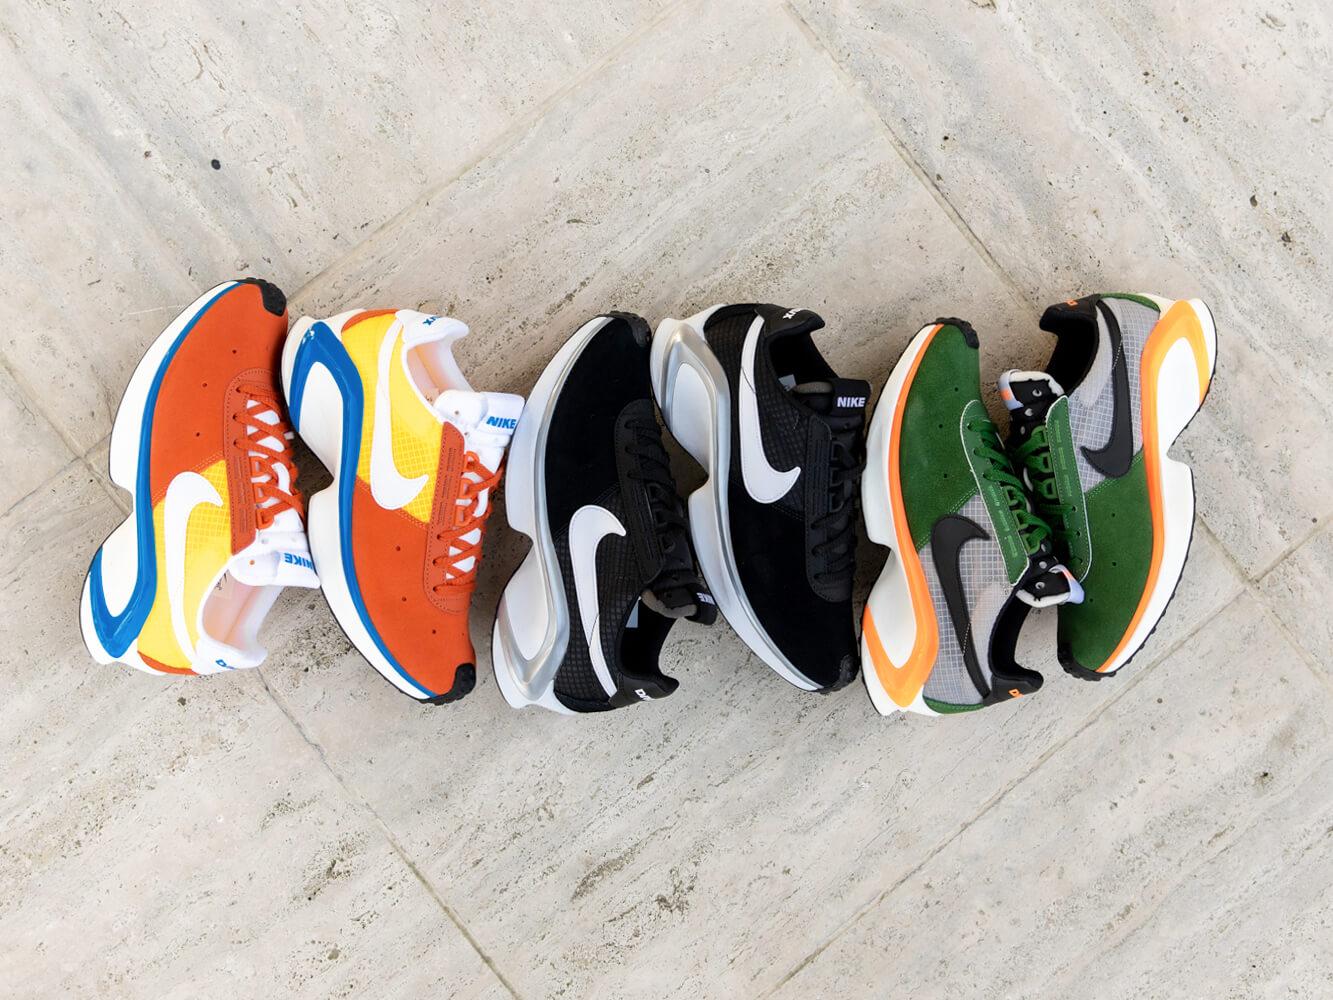 recinto Colgar Humillar  Sneaker District online shop - Livraison gratuite NL/BE/DE/FR